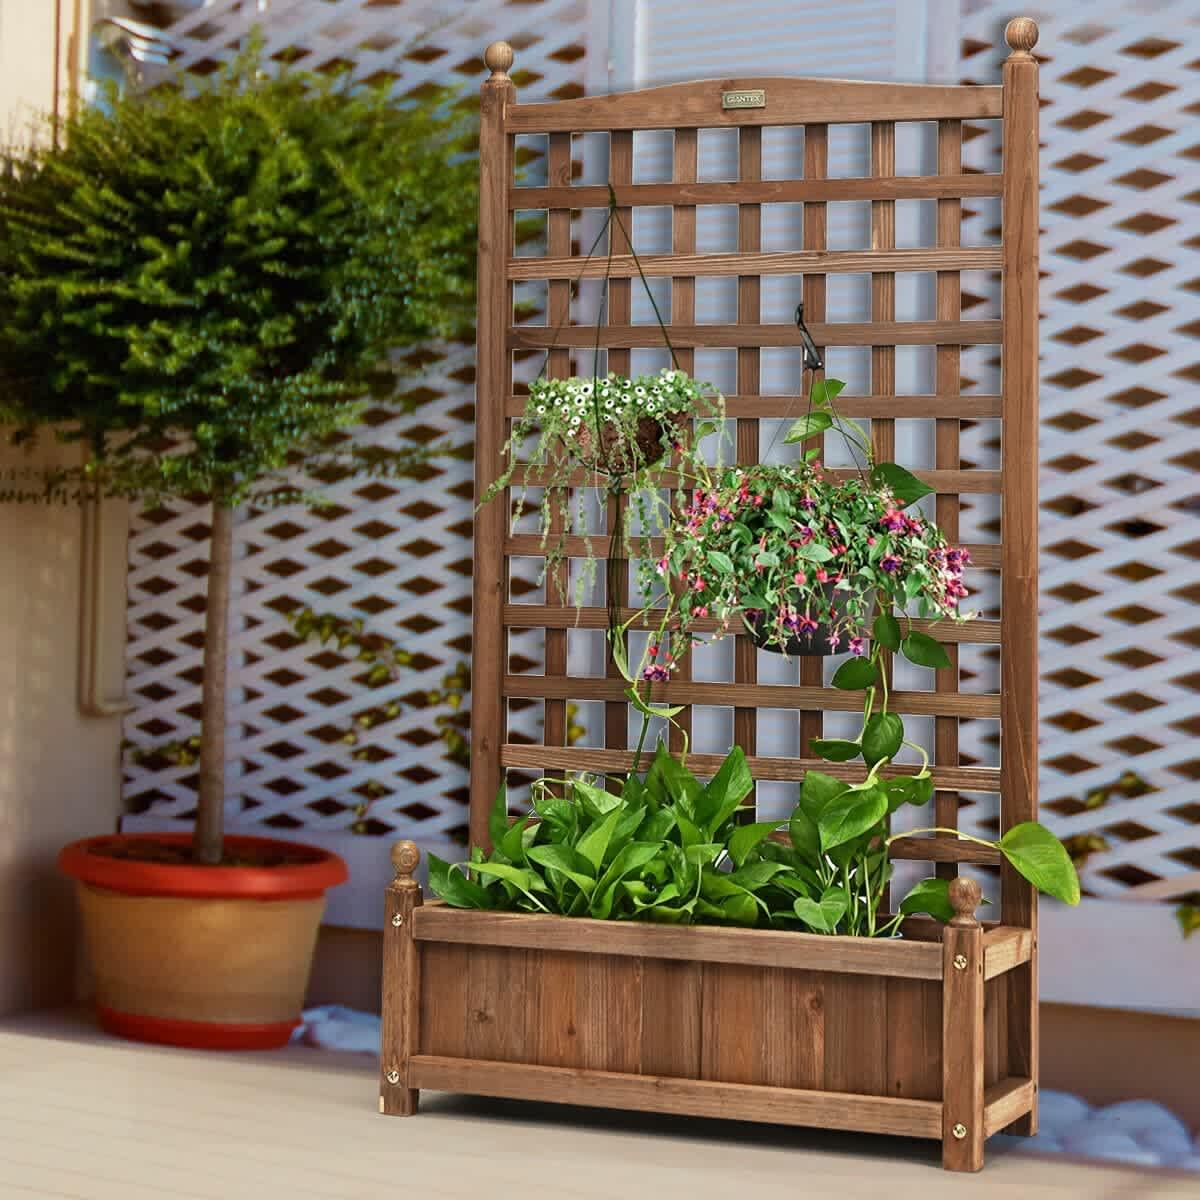 Costway Wood Planter Box with Trellis